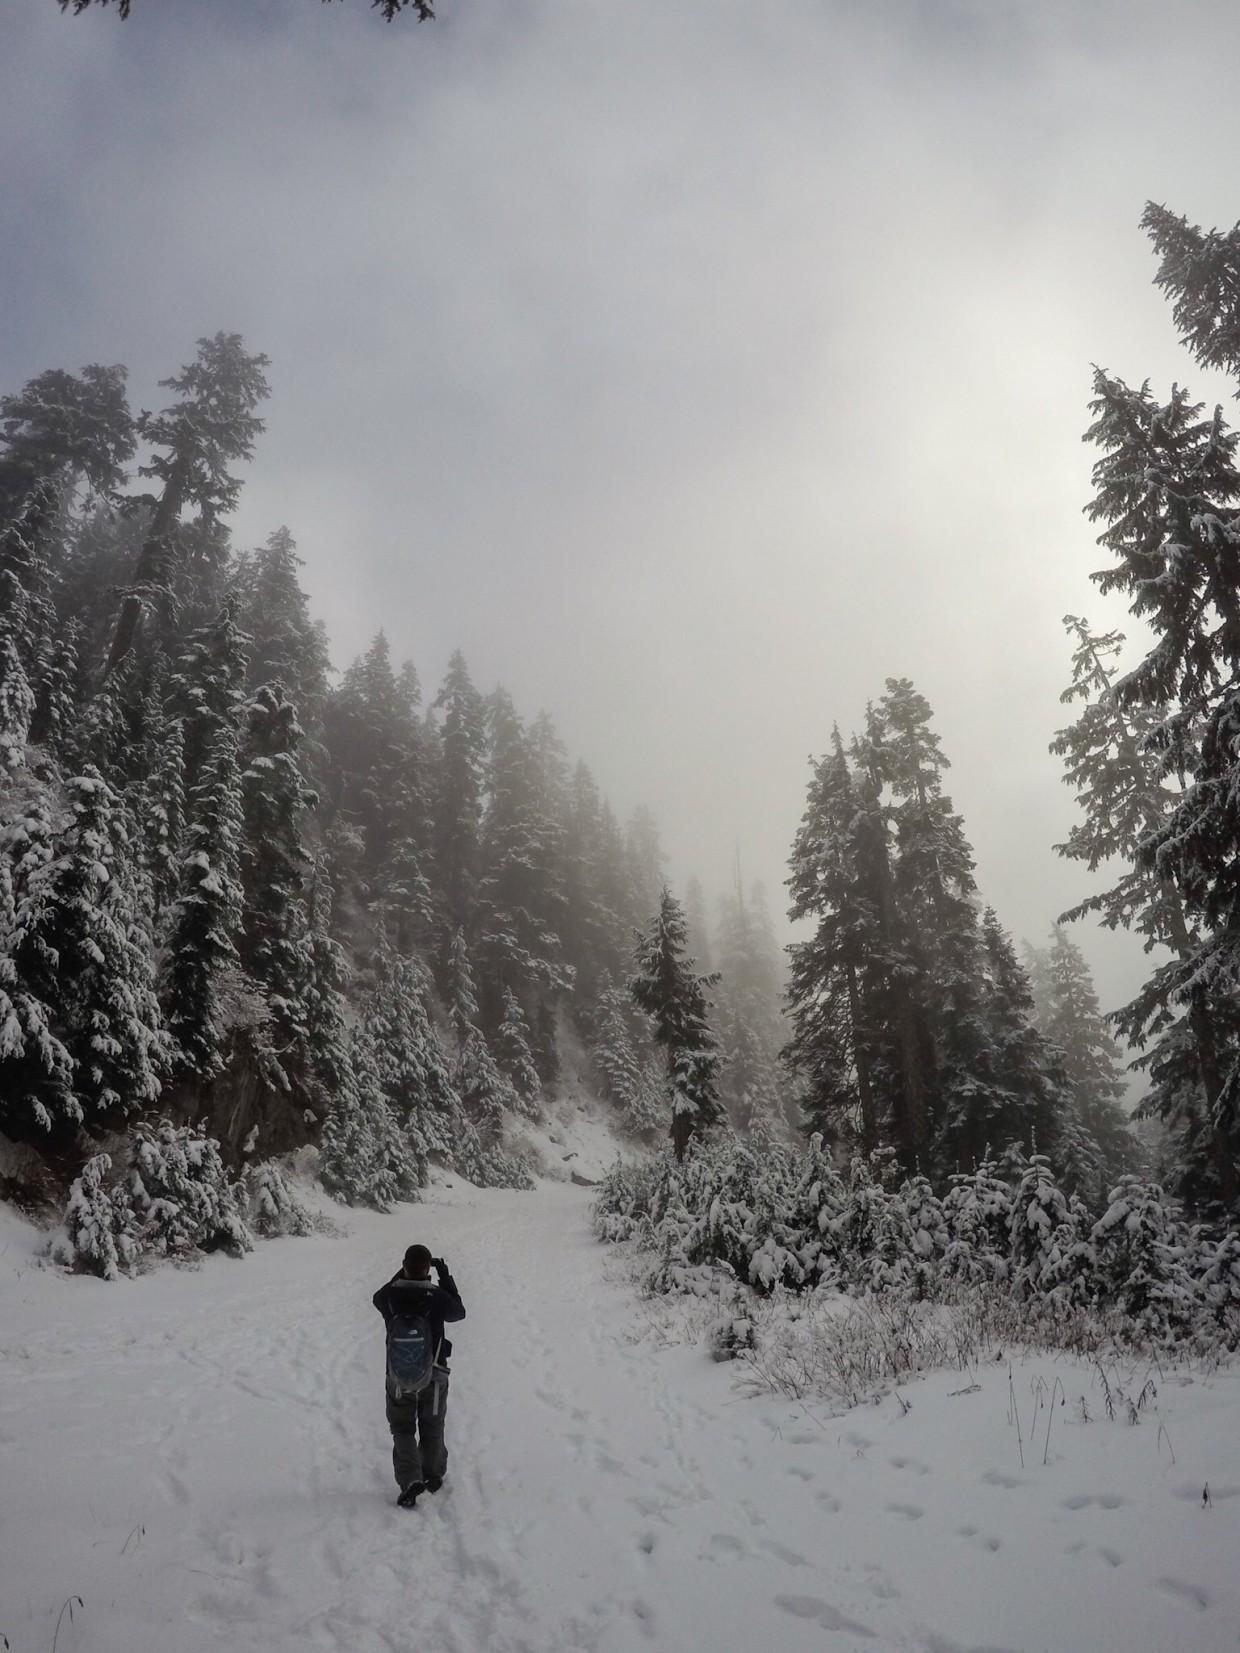 More fog on Grouse Mountain